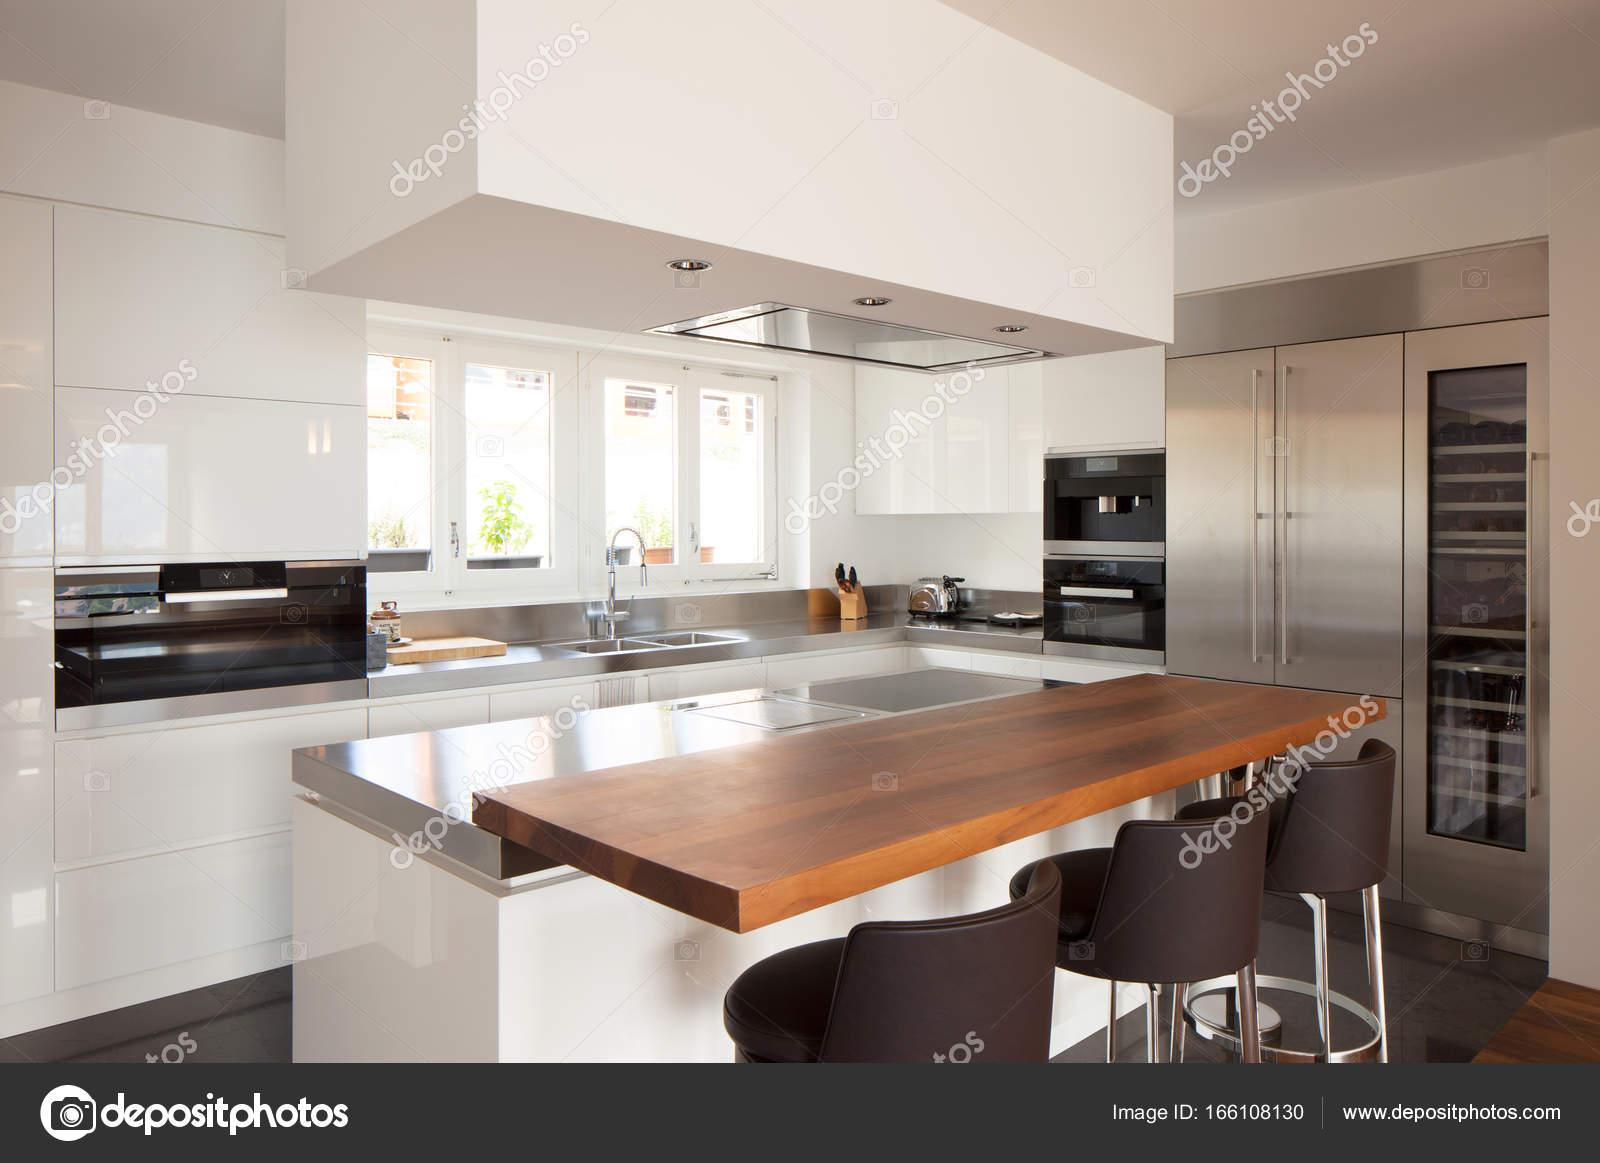 Moderne keuken en luxe mynextcar